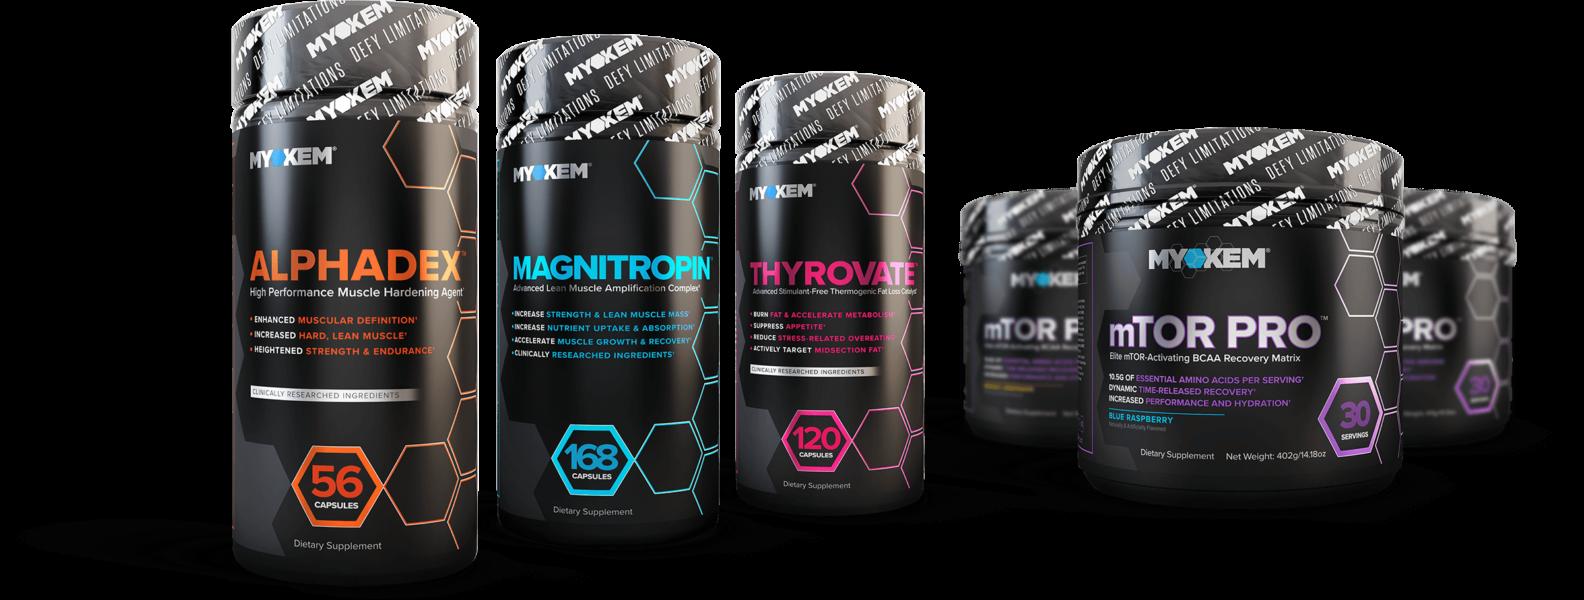 Alphadex, Magnitropin, Thyrovate, mTOR Pro